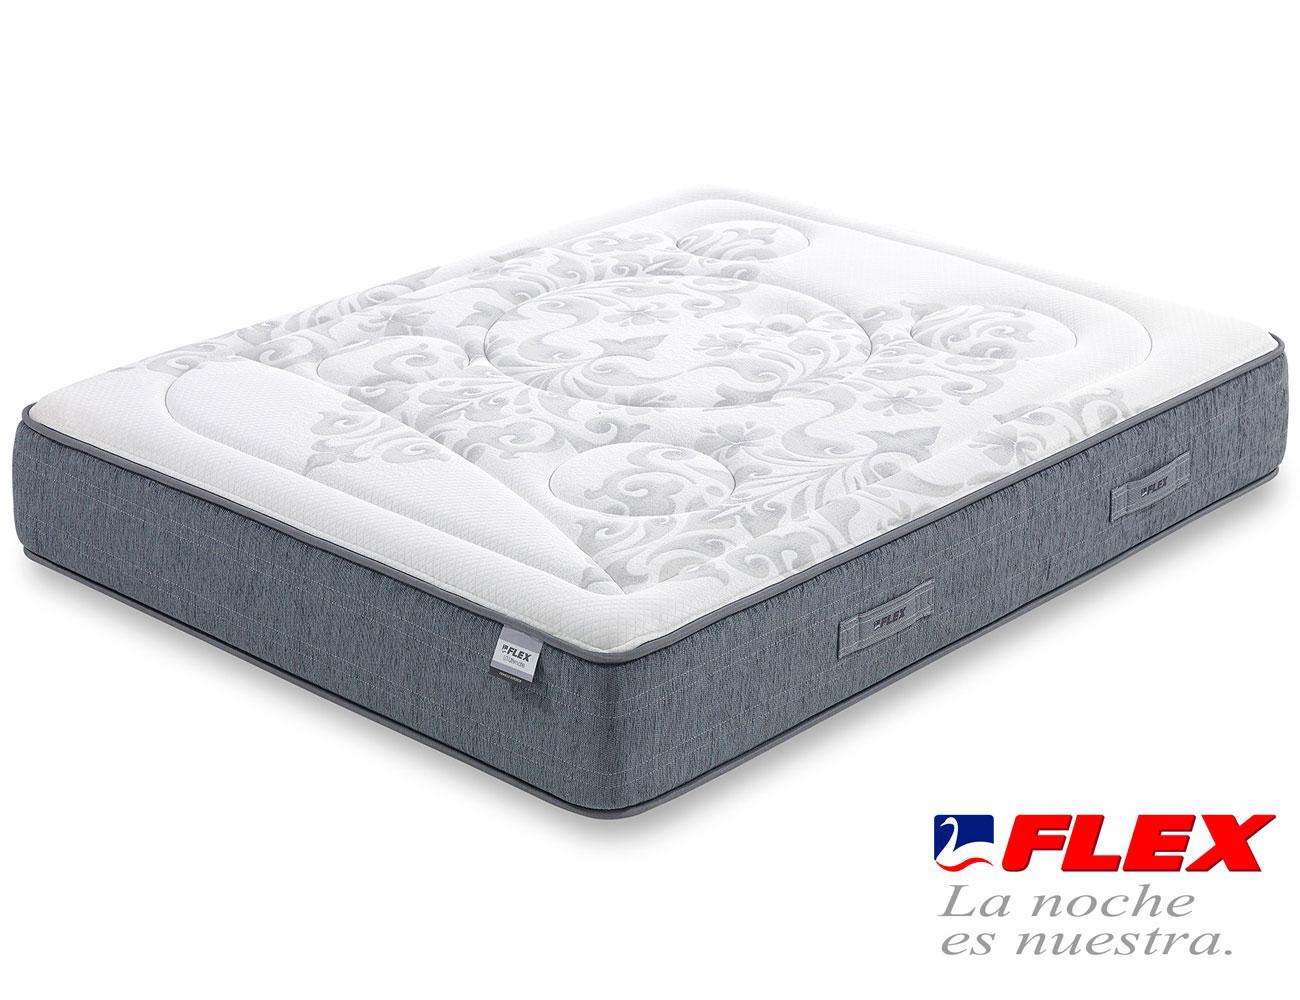 Colchon flex airvex viscoelastica gel garbi superior12